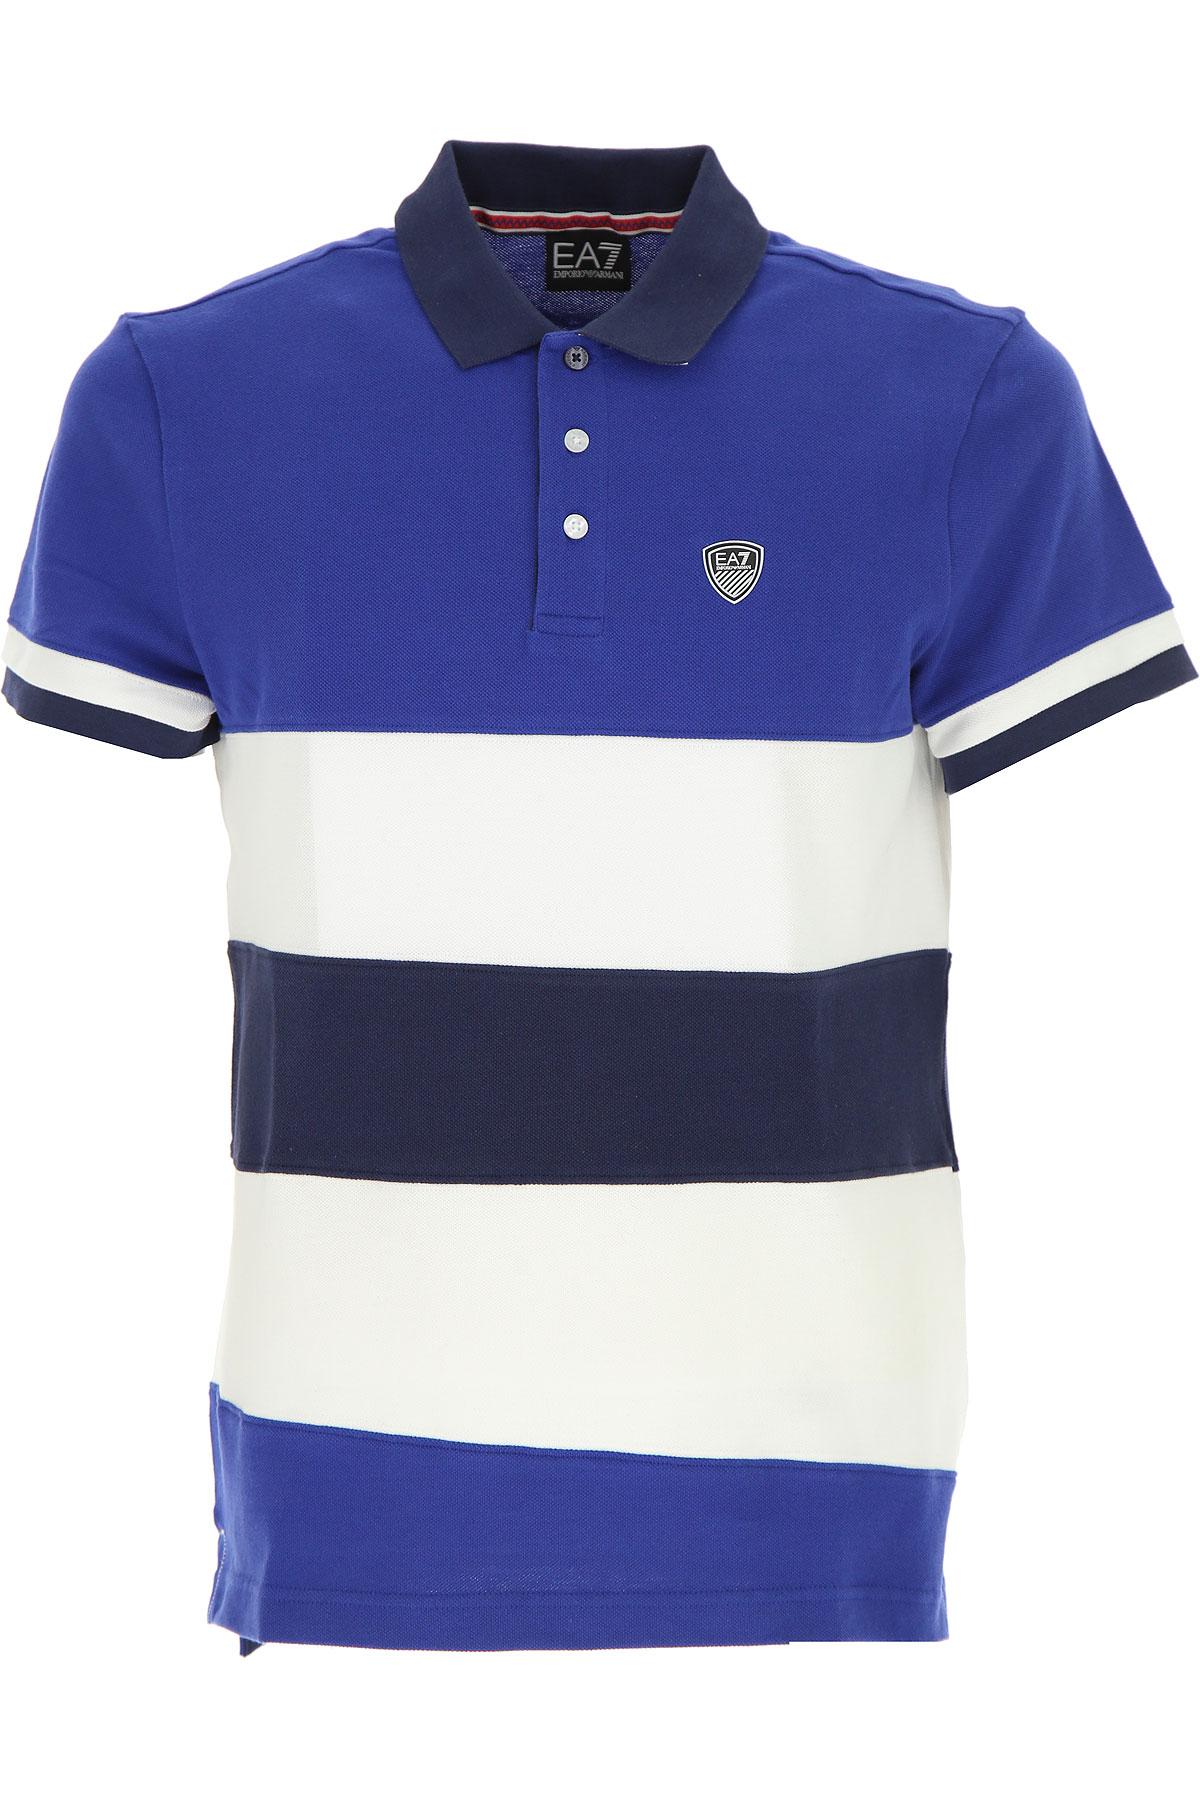 9520d0c4 Giorgio Armani Polo Shirts Sale - DREAMWORKS